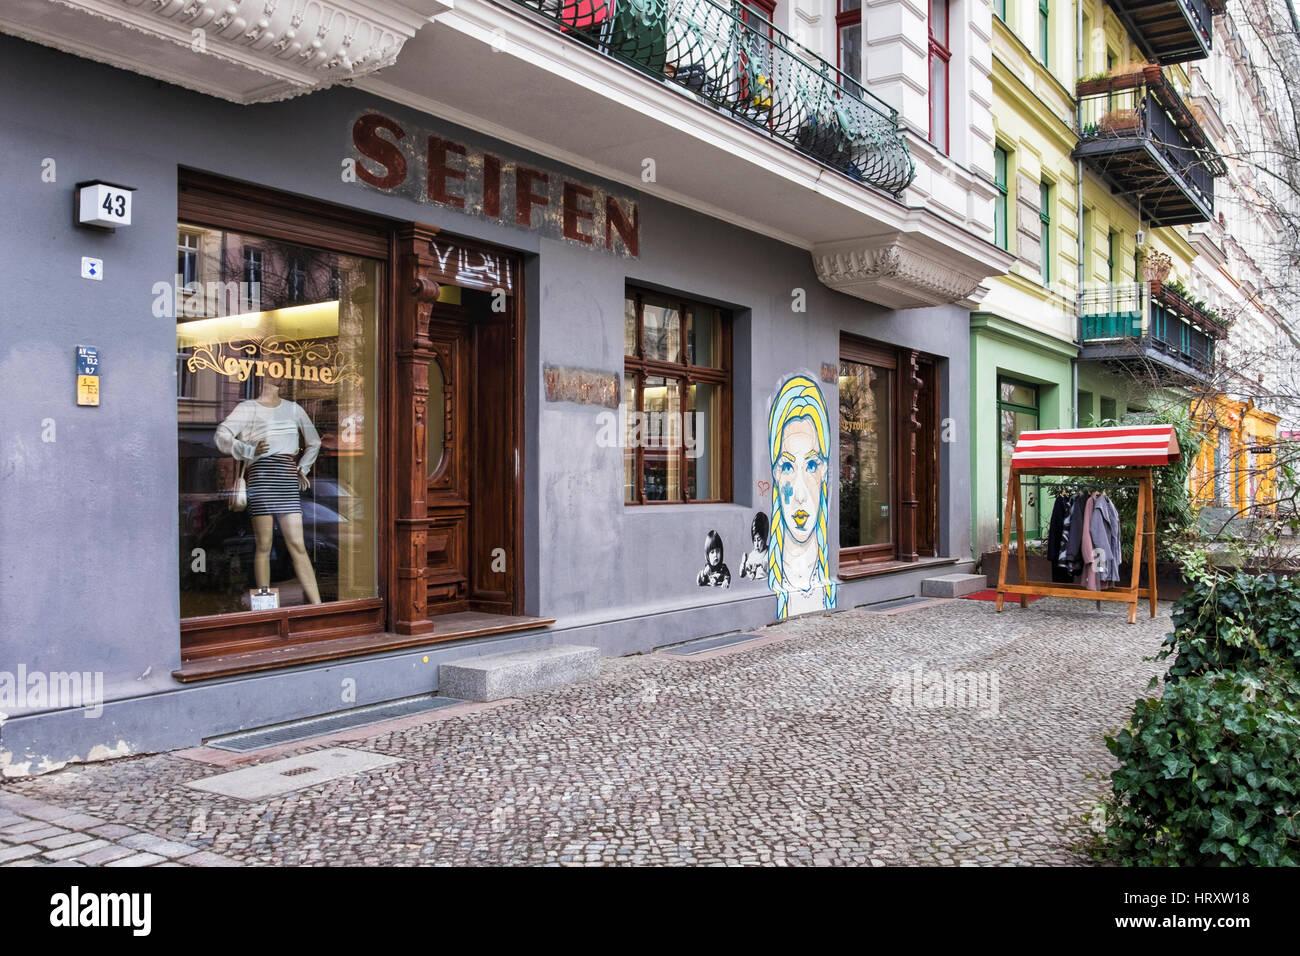 Berlin, Prenzlauer Berg. Street scene, Cyroline Upmarket clothing shop,old preserved shop sign and El Bocho street art Stock Photo